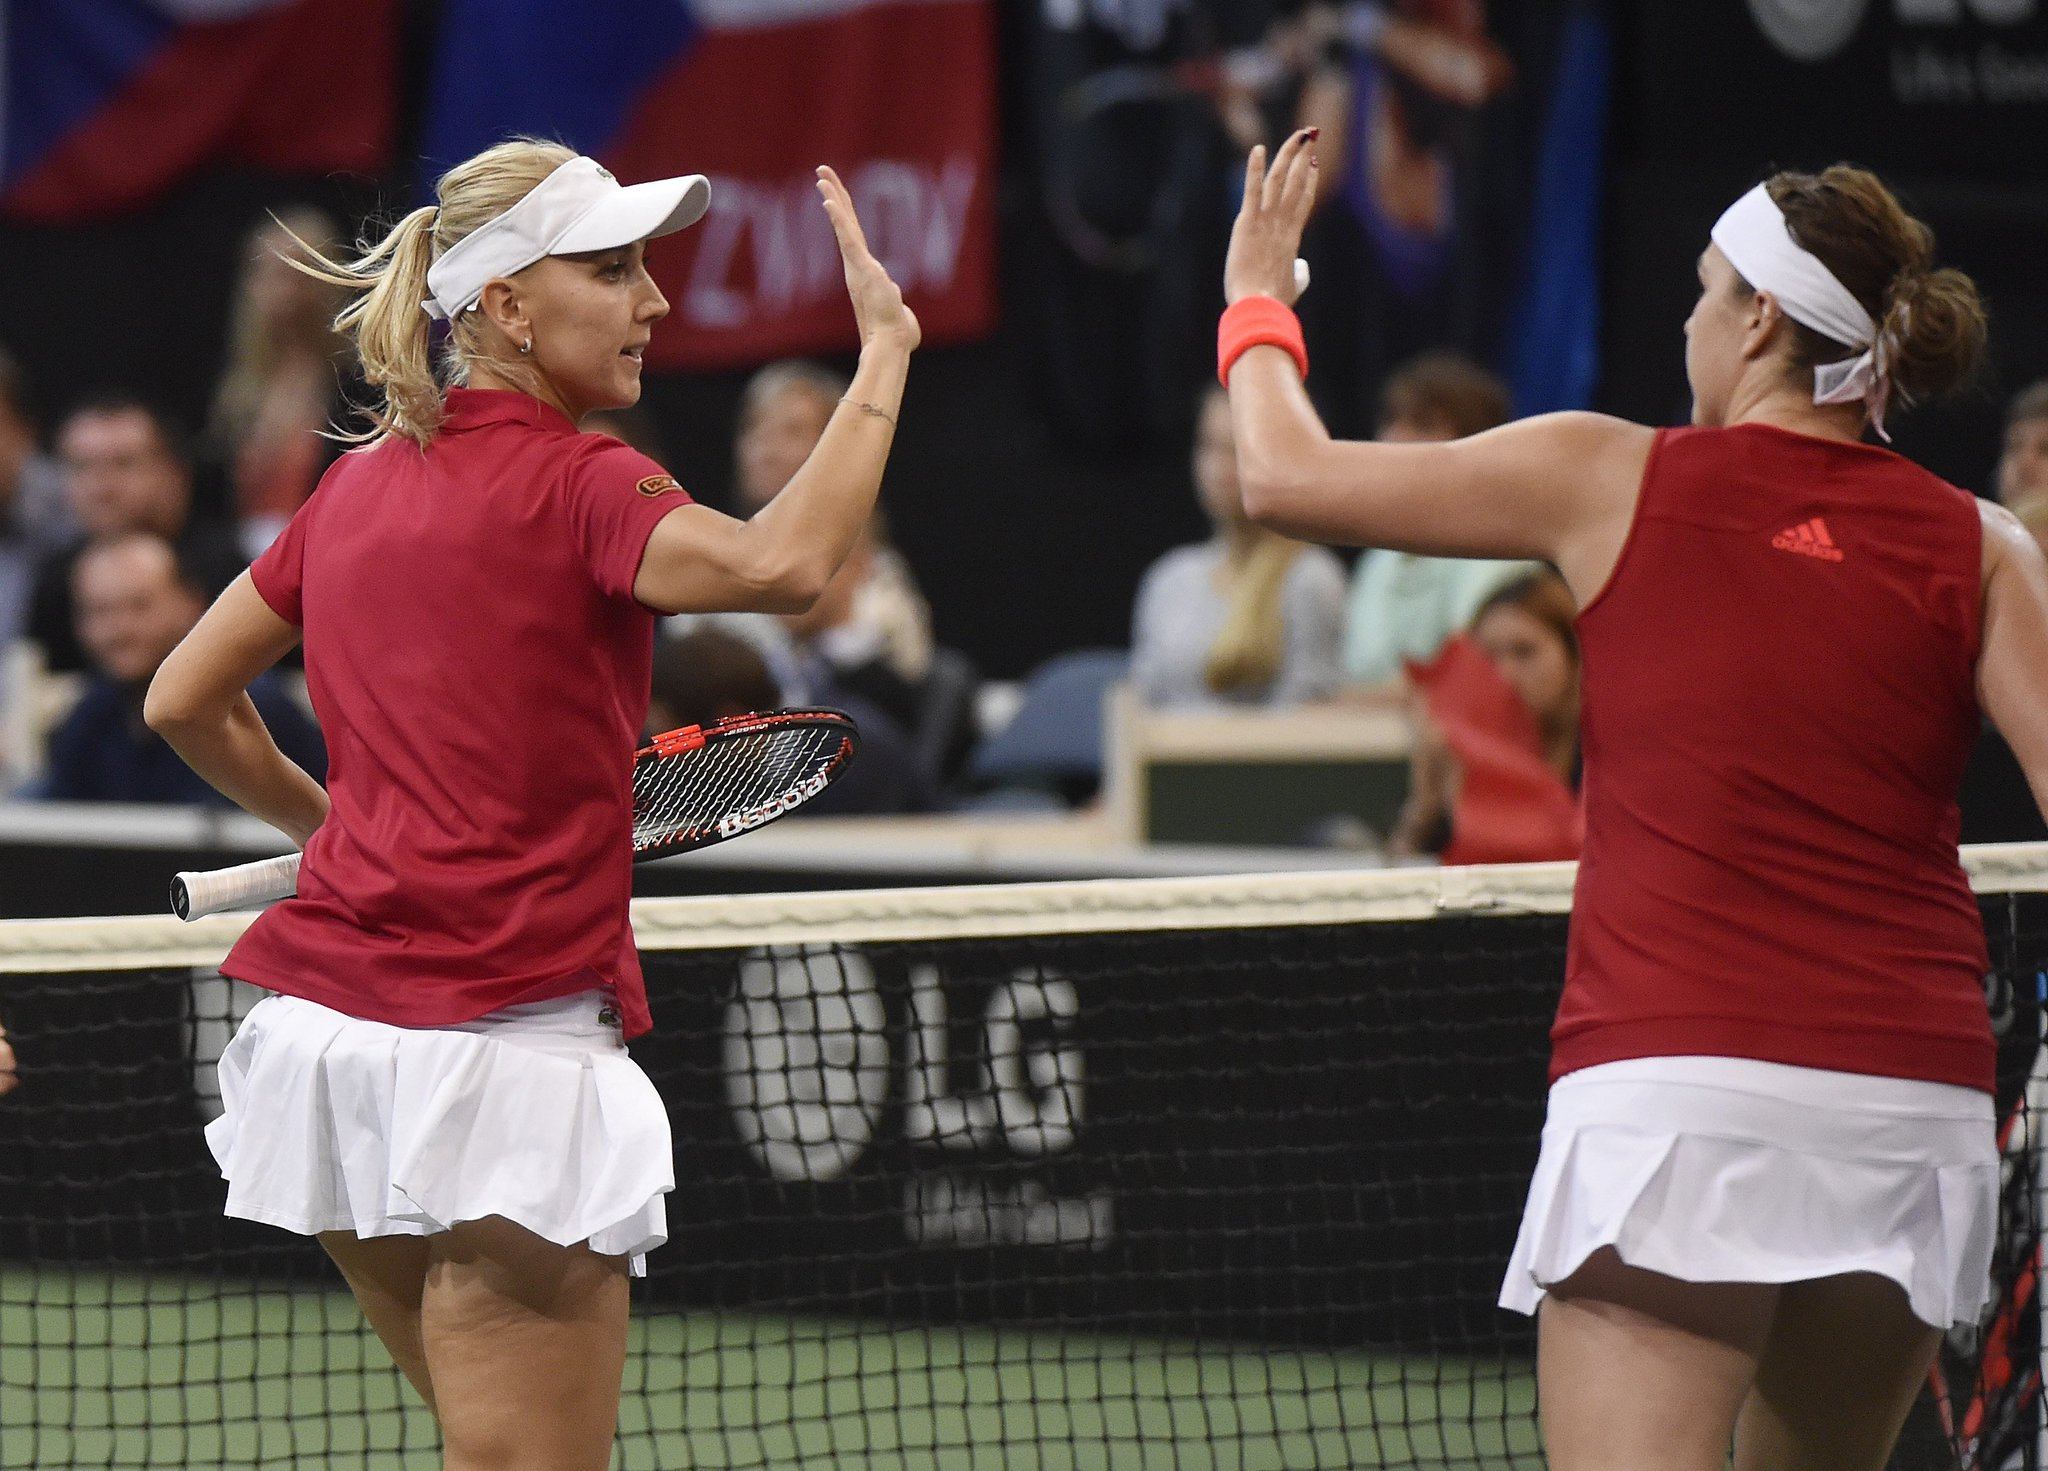 Elena Vesnina and Anastasia Pavlyuchenkova celebrate their opening set win (Source: Fed Cup)